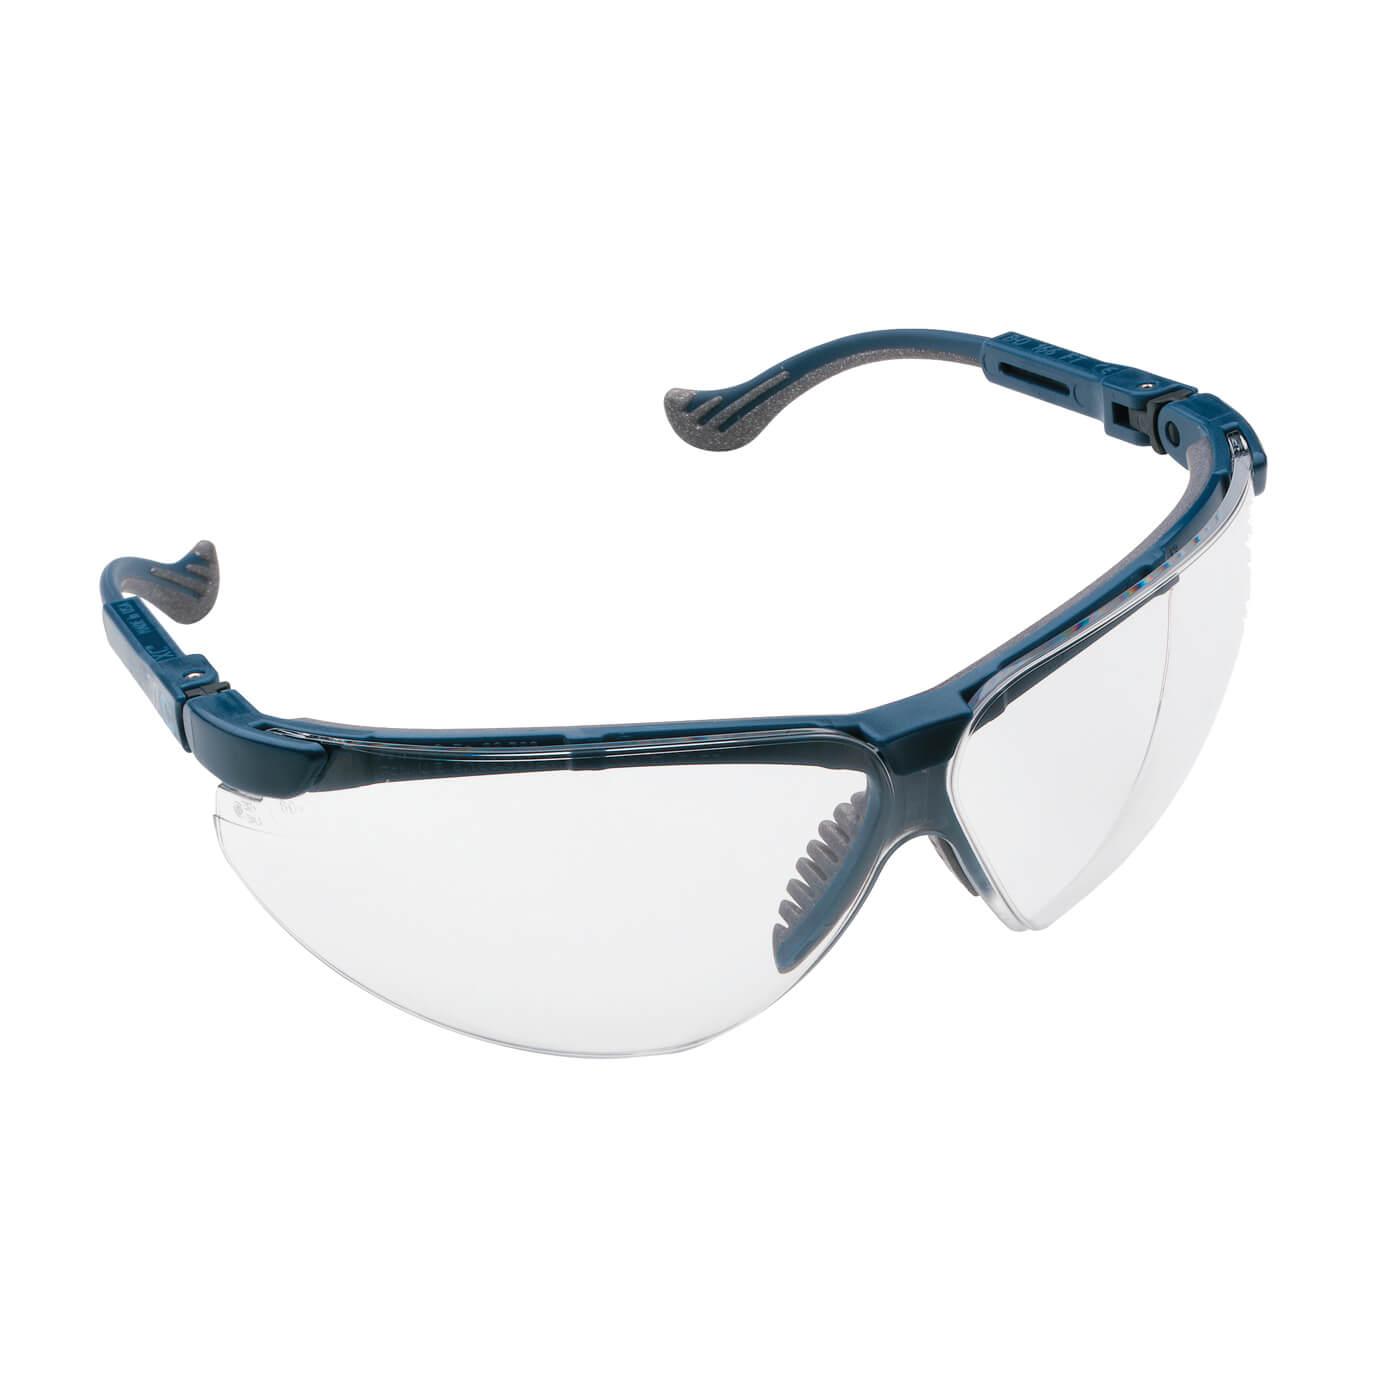 Okulary ochronne XC Honeywell bezbarwna soczewka